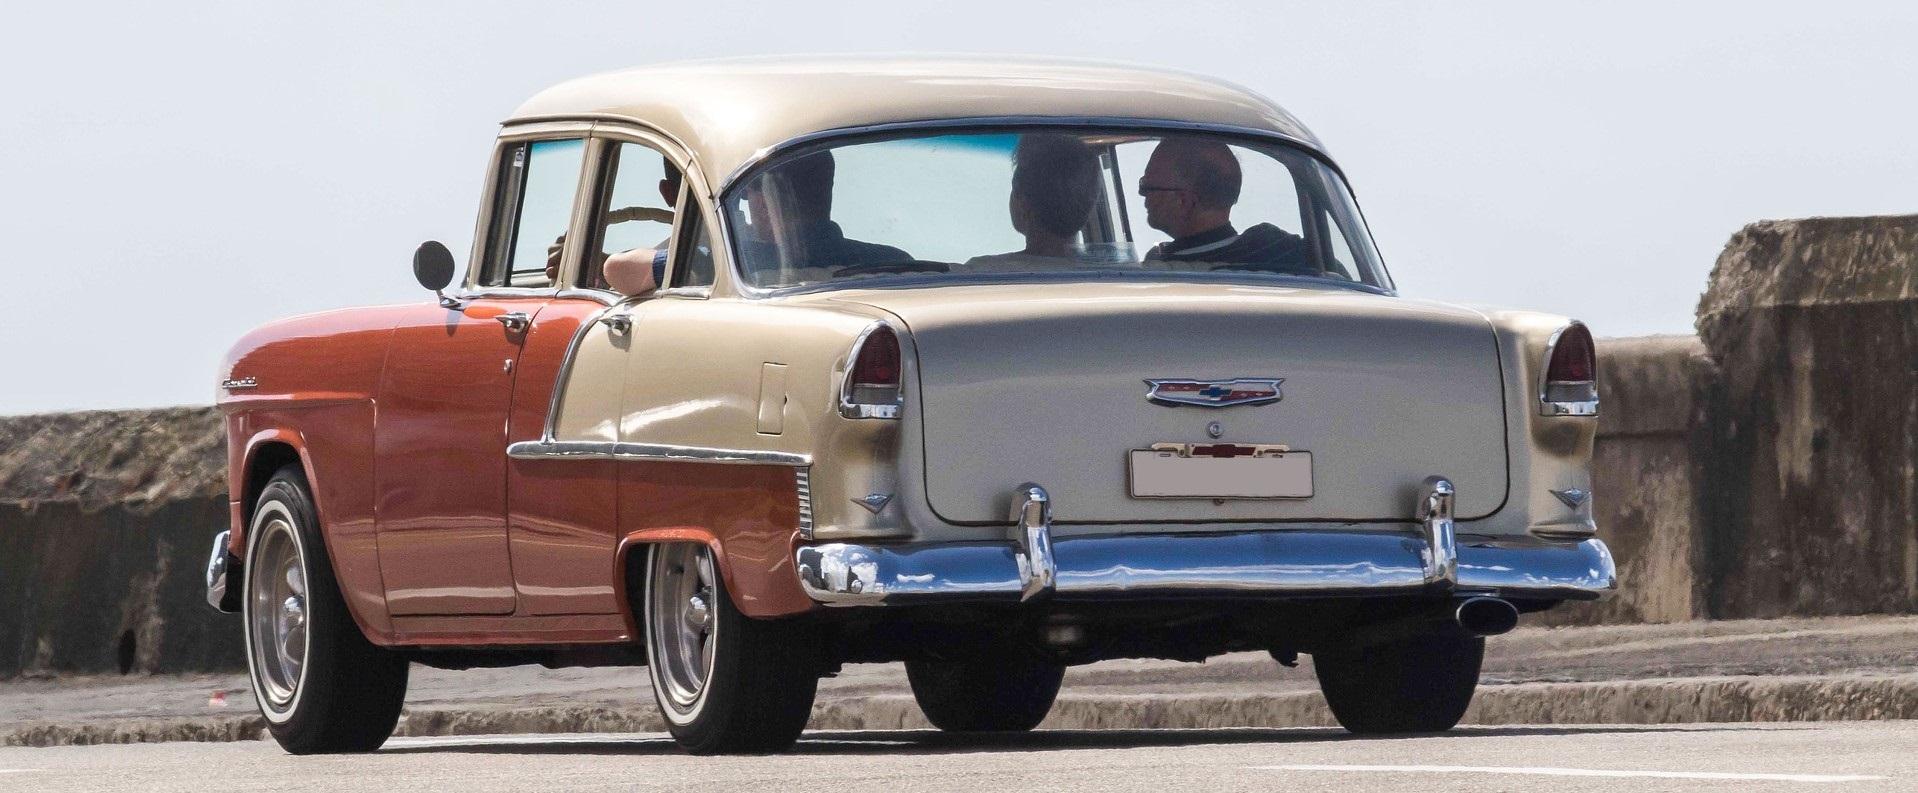 Oldtimer Car in Aurora, Colorado | Kids Car Donations